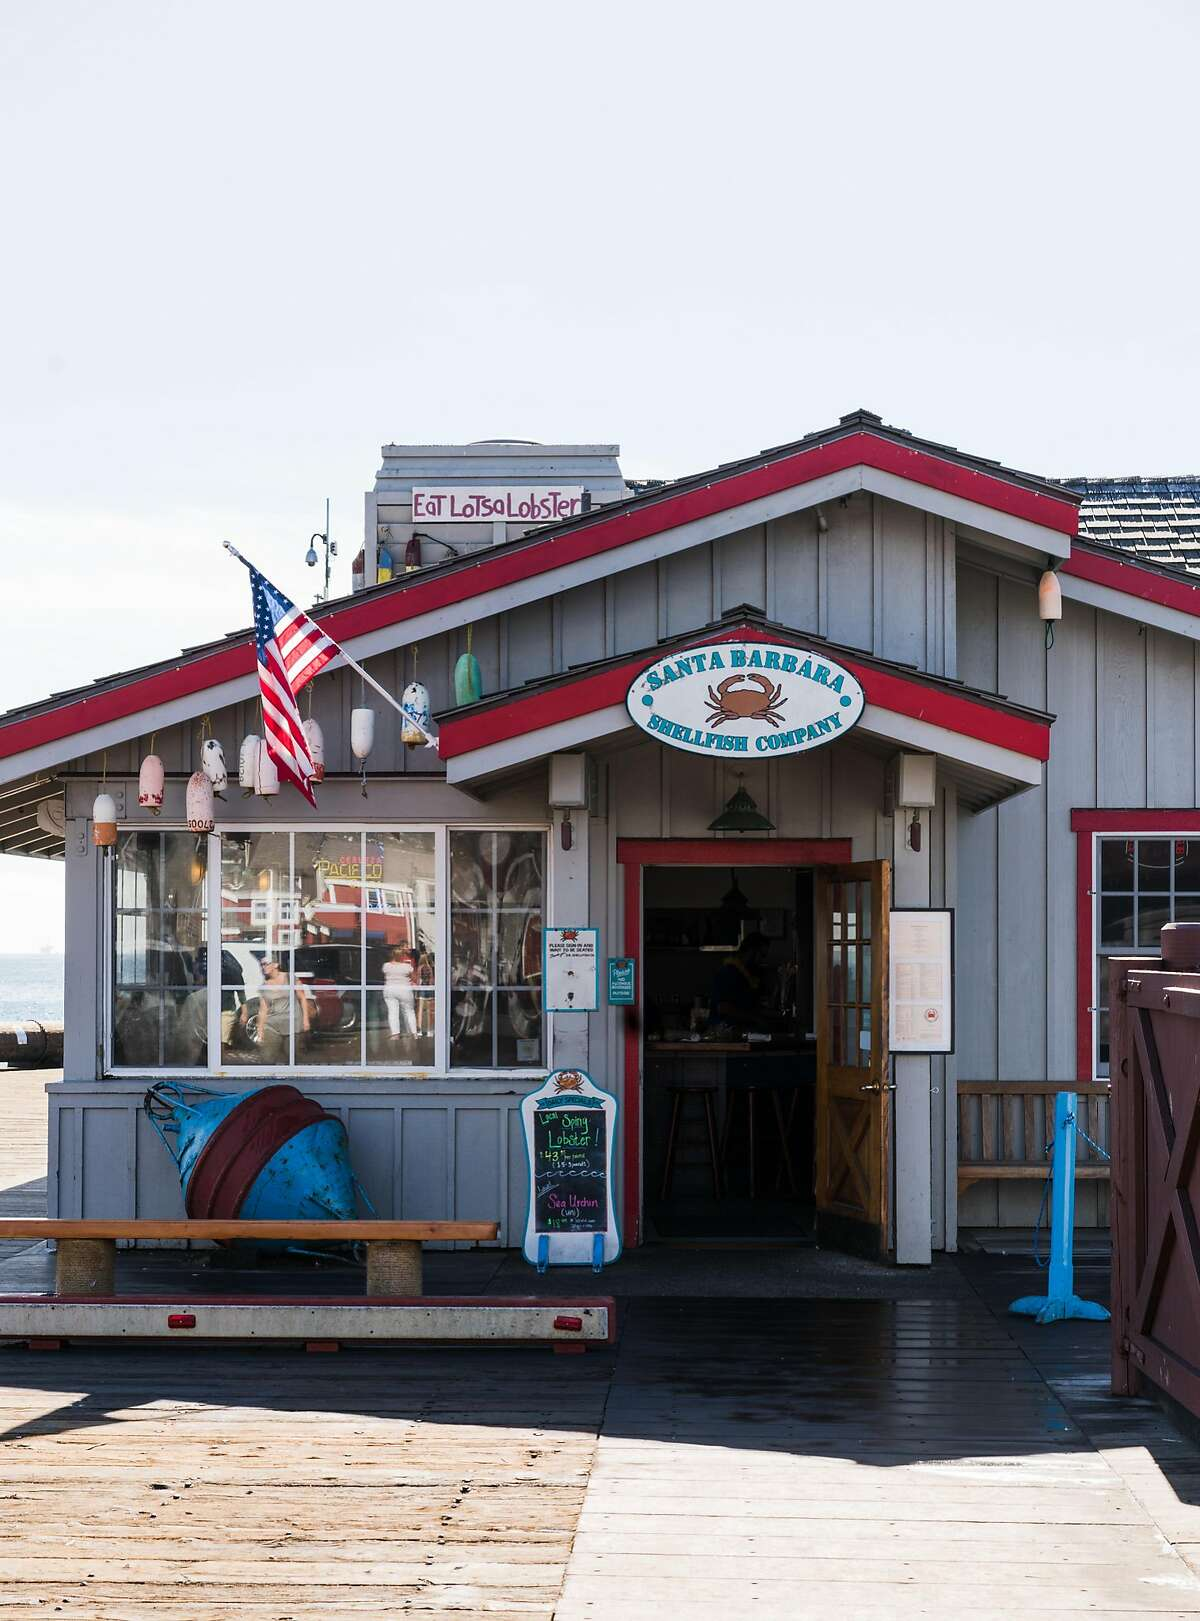 The Santa Barbara Shellfish Company on Stearns Warf.